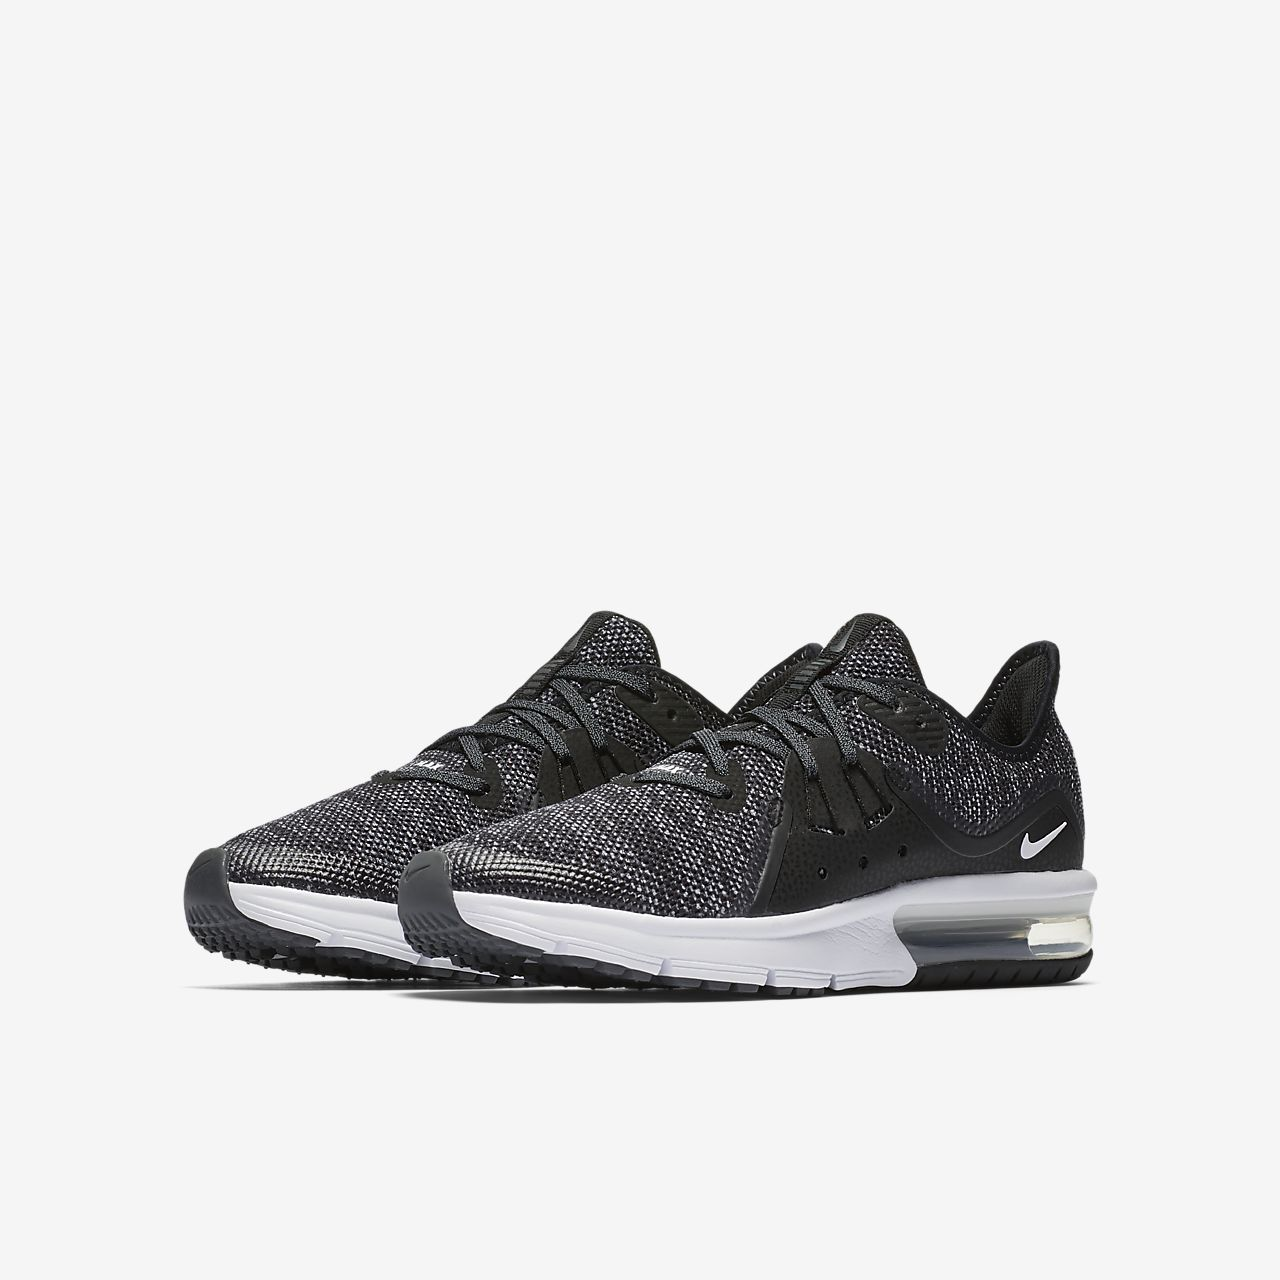 timeless design beafa a0dd0 ... Nike Air Max Sequent 3 Older Kids  Running Shoe